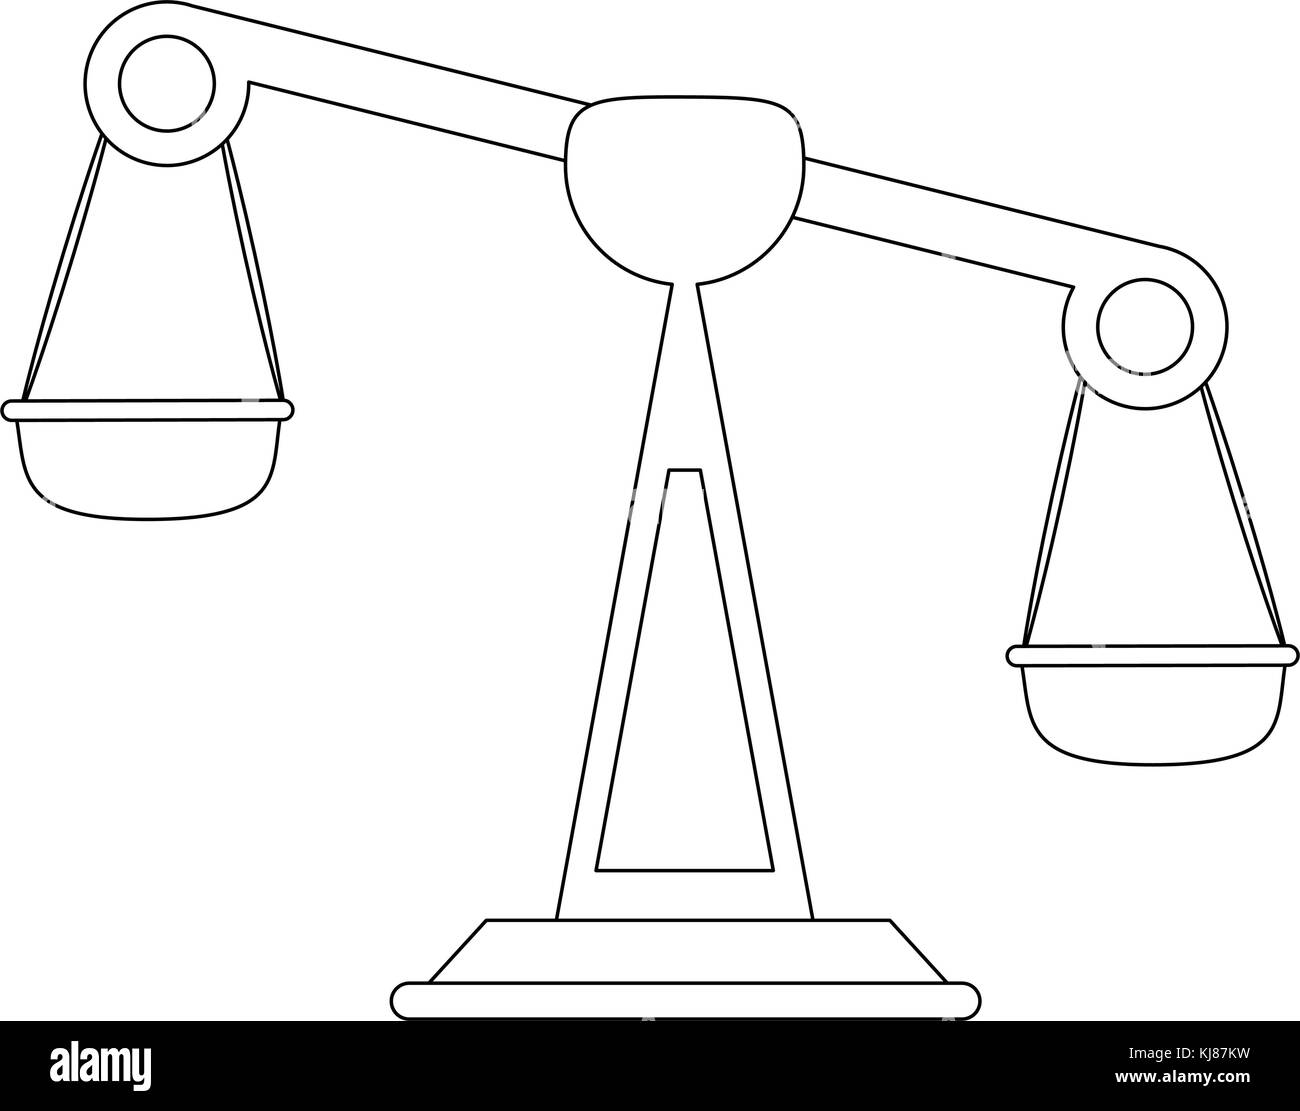 Balance justice symbol - Stock Image